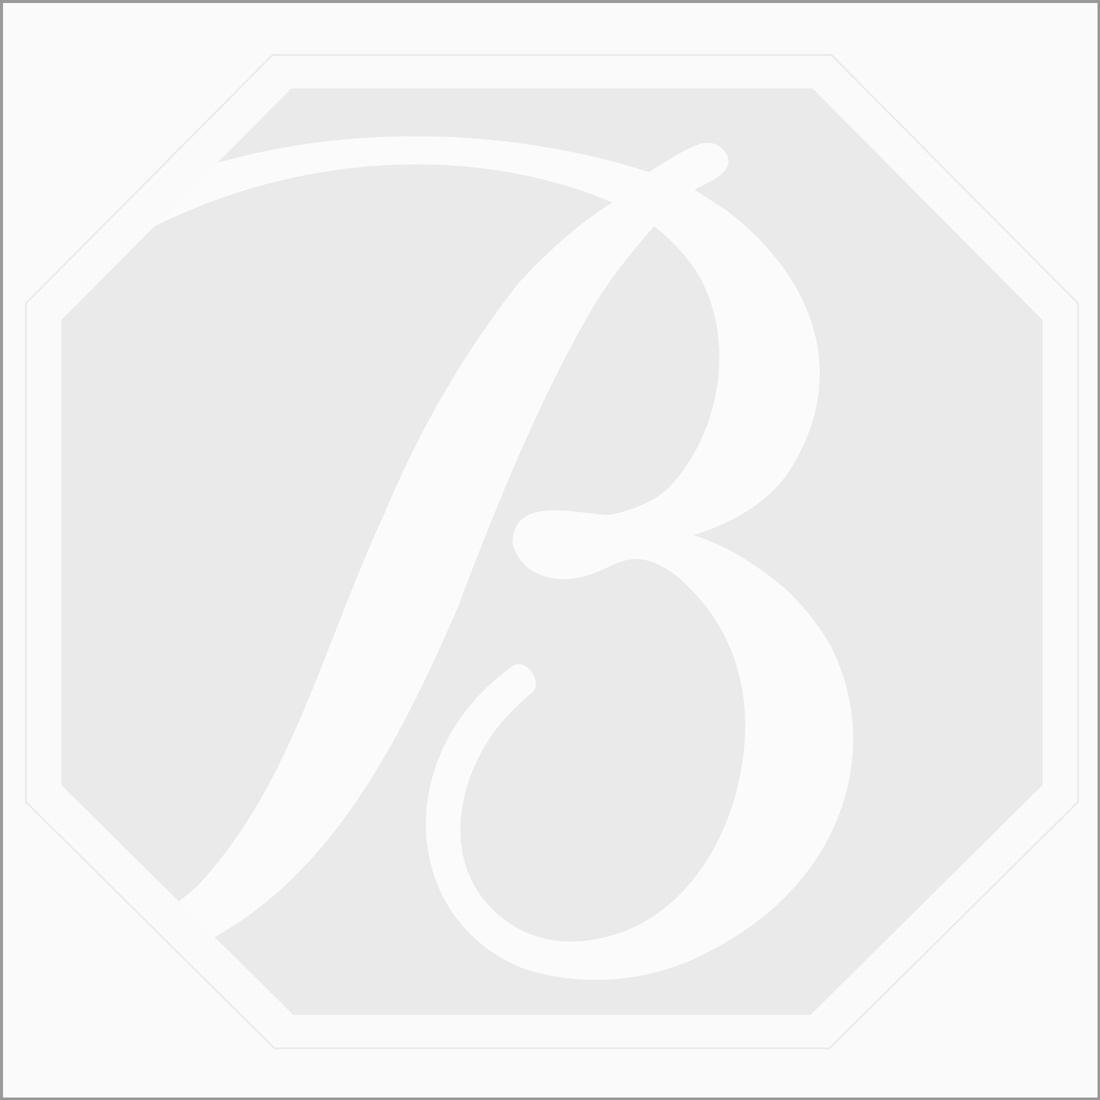 34 x 27 mm - Watermelon (Bi-Color) Tourmaline Carving - 101.00 carats (ToCarv1005)